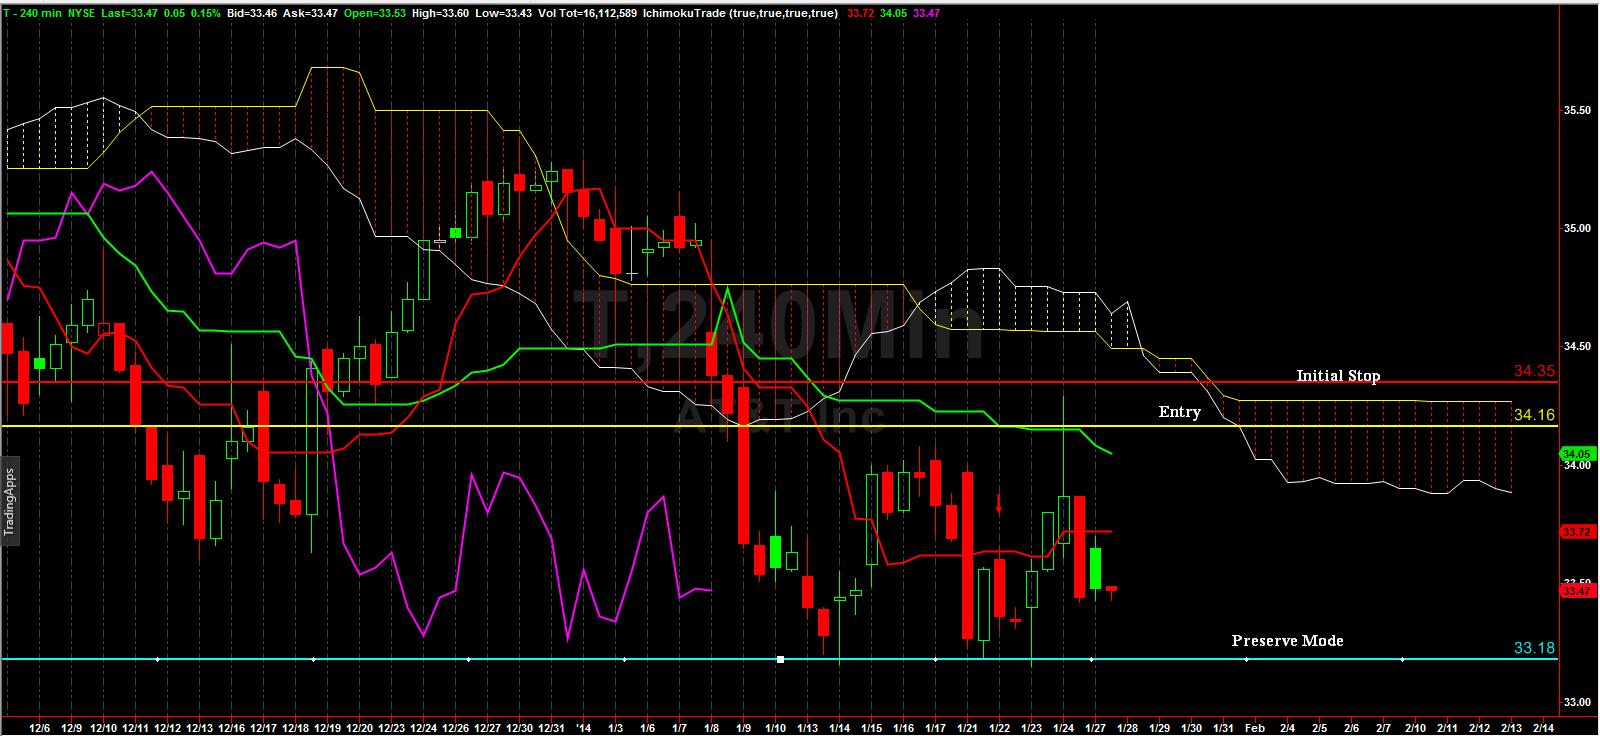 Weekly_stock_jan27_2014_chart